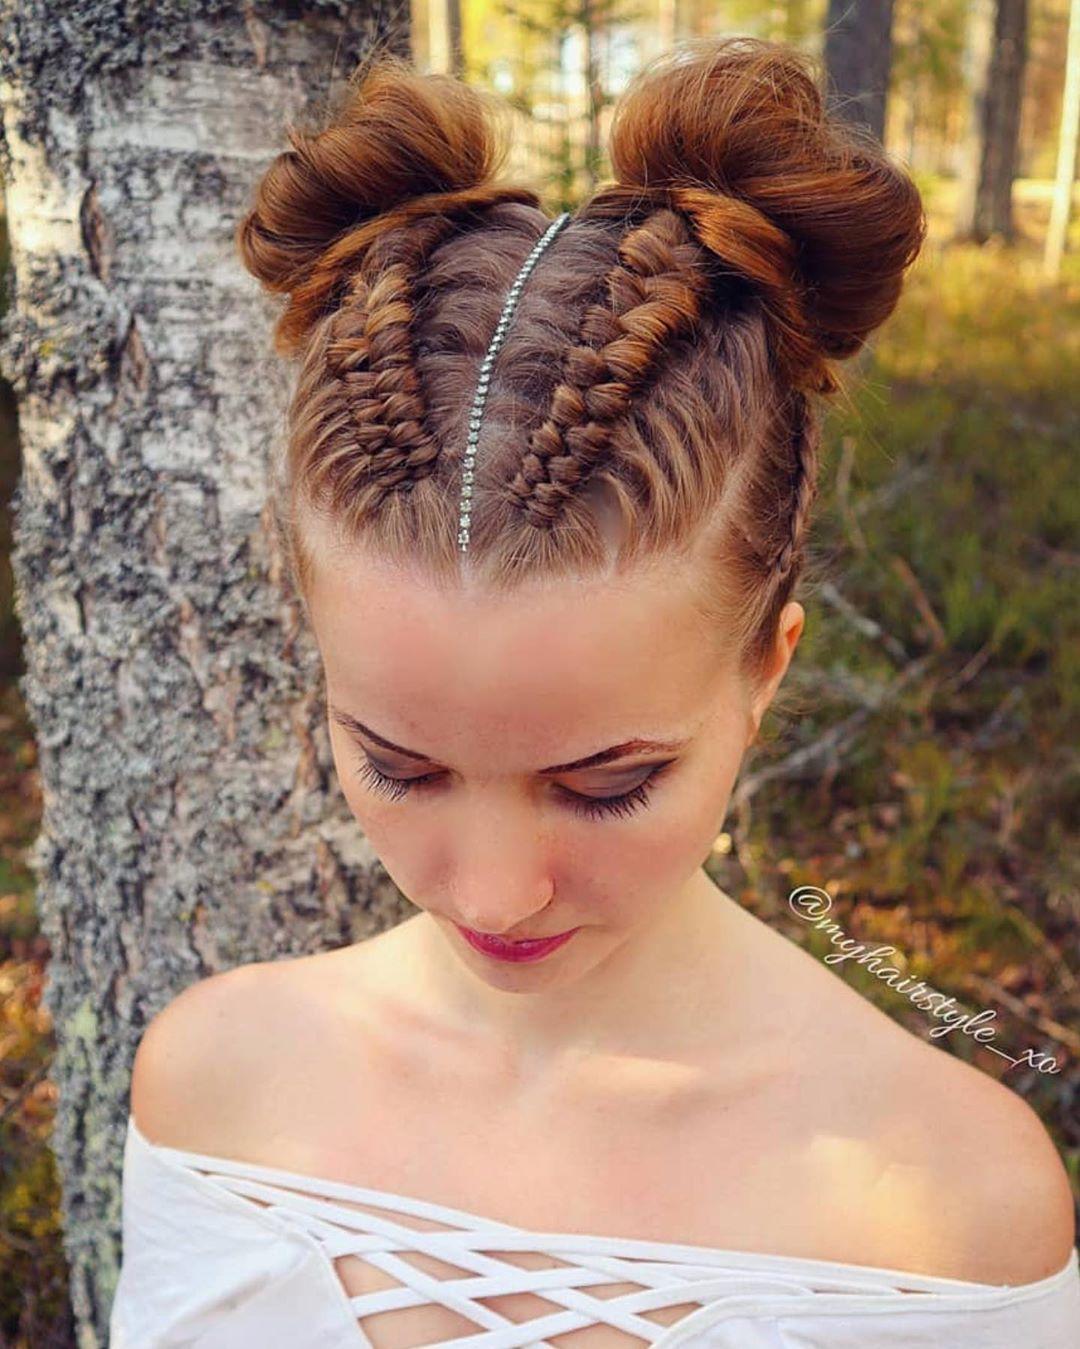 33 Best 2019 Hairstyles And Haircuts For Female Braids For Short Hair Viking Hair Hair Styles